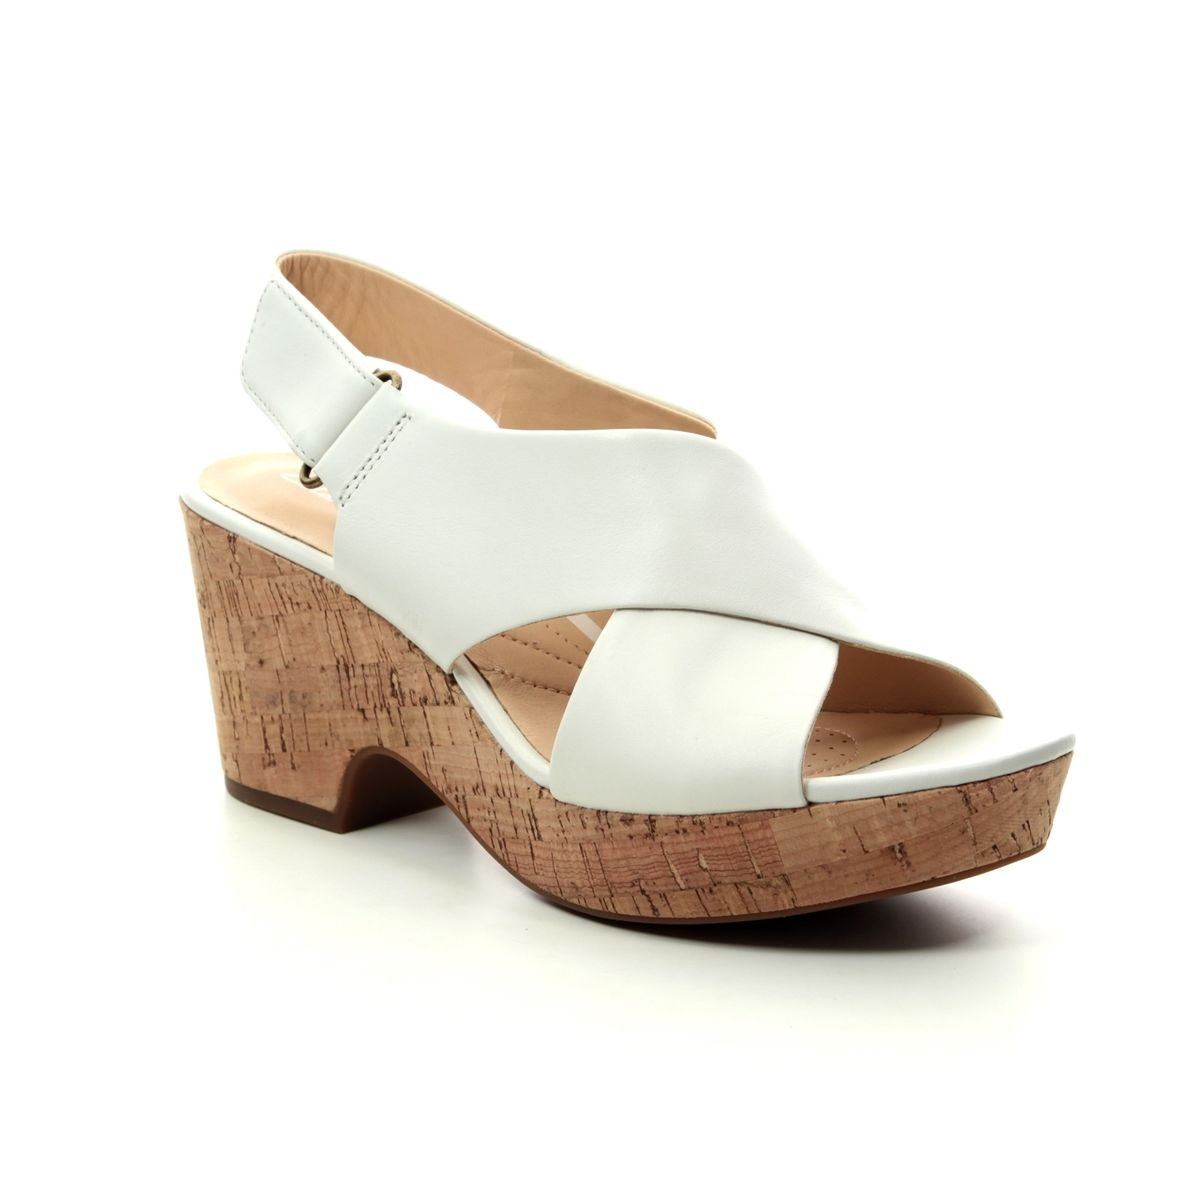 35a5bf709b9 Clarks Wedge Sandals - White - 413754D MARITSA LARA